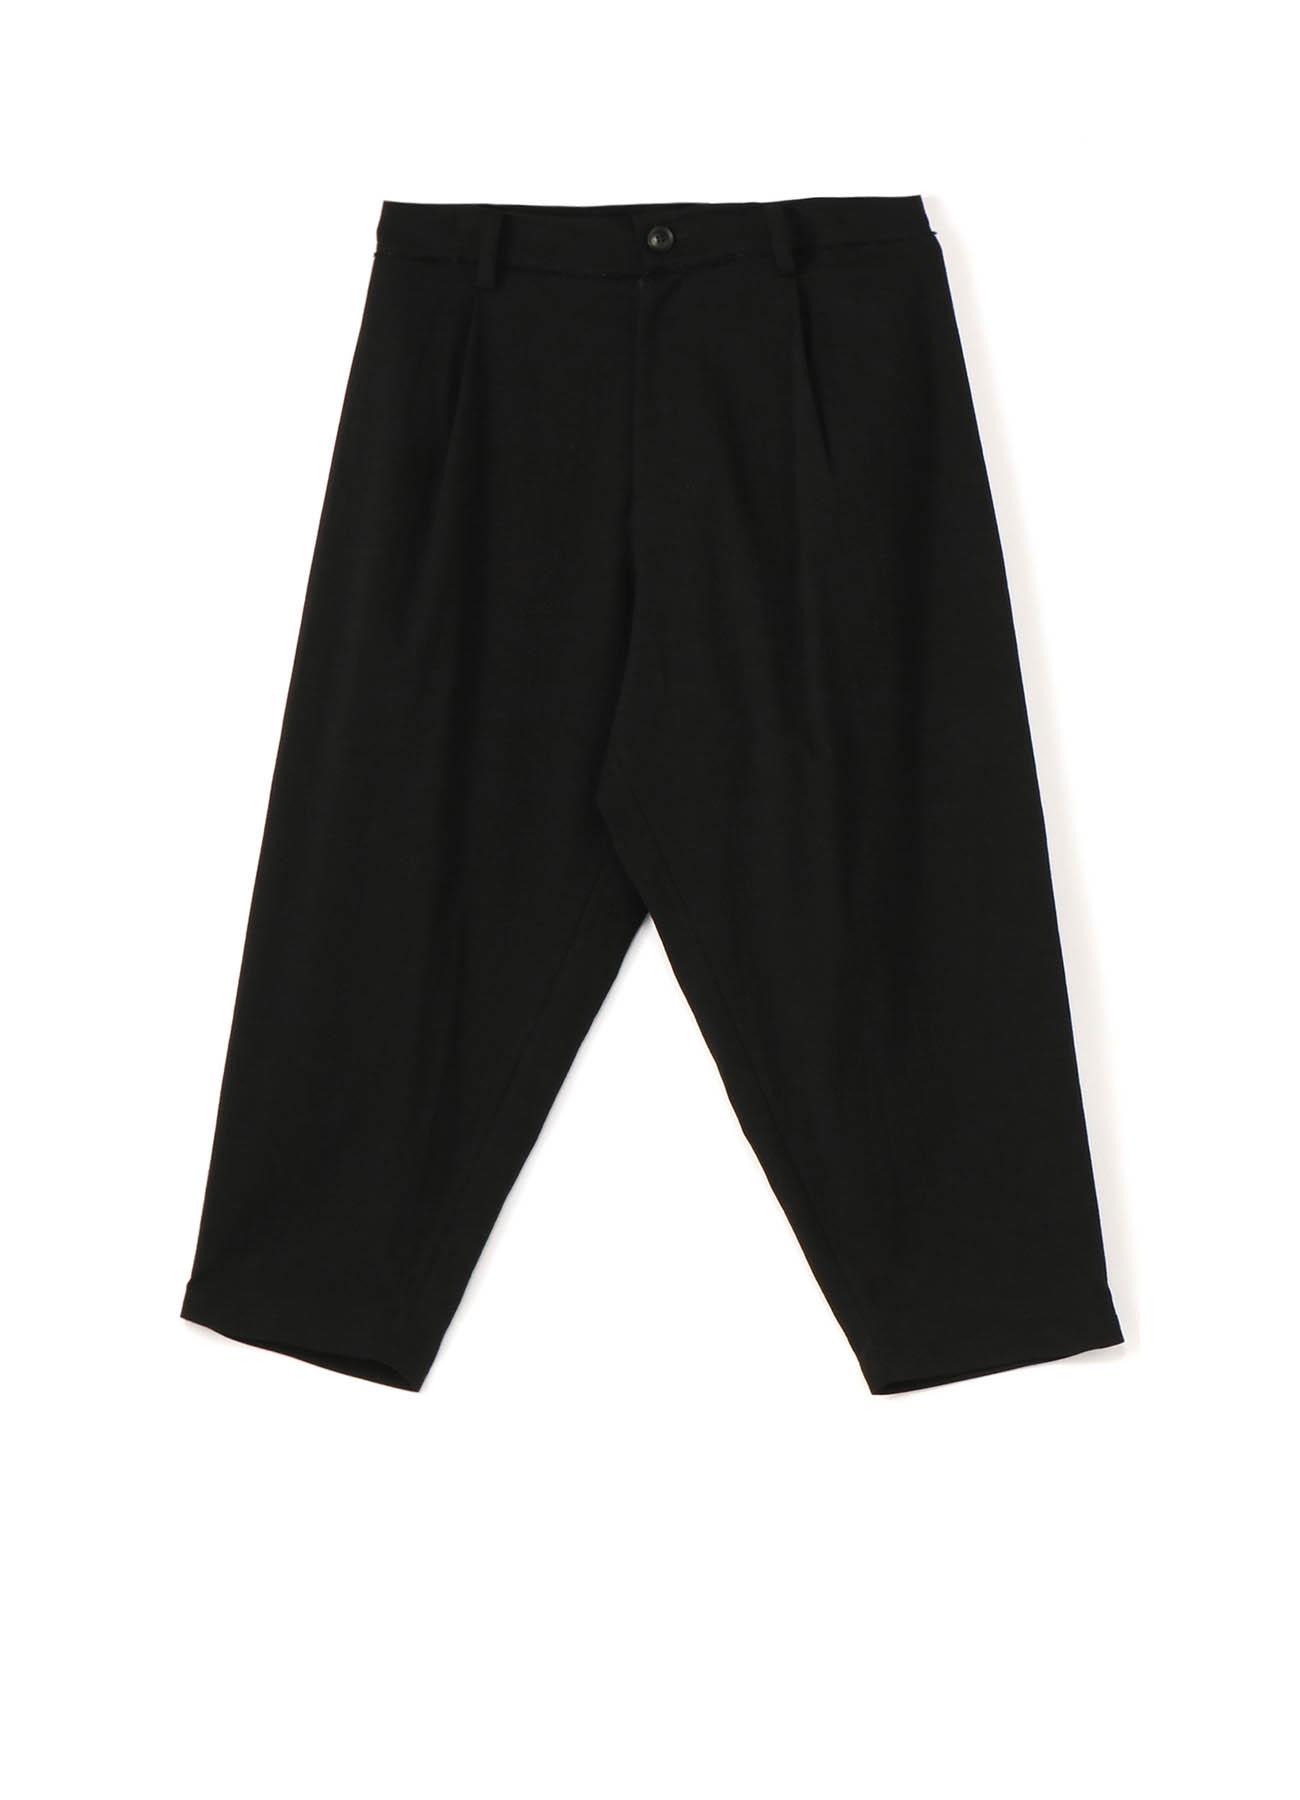 C/Li Calico A 2Tuck Pants